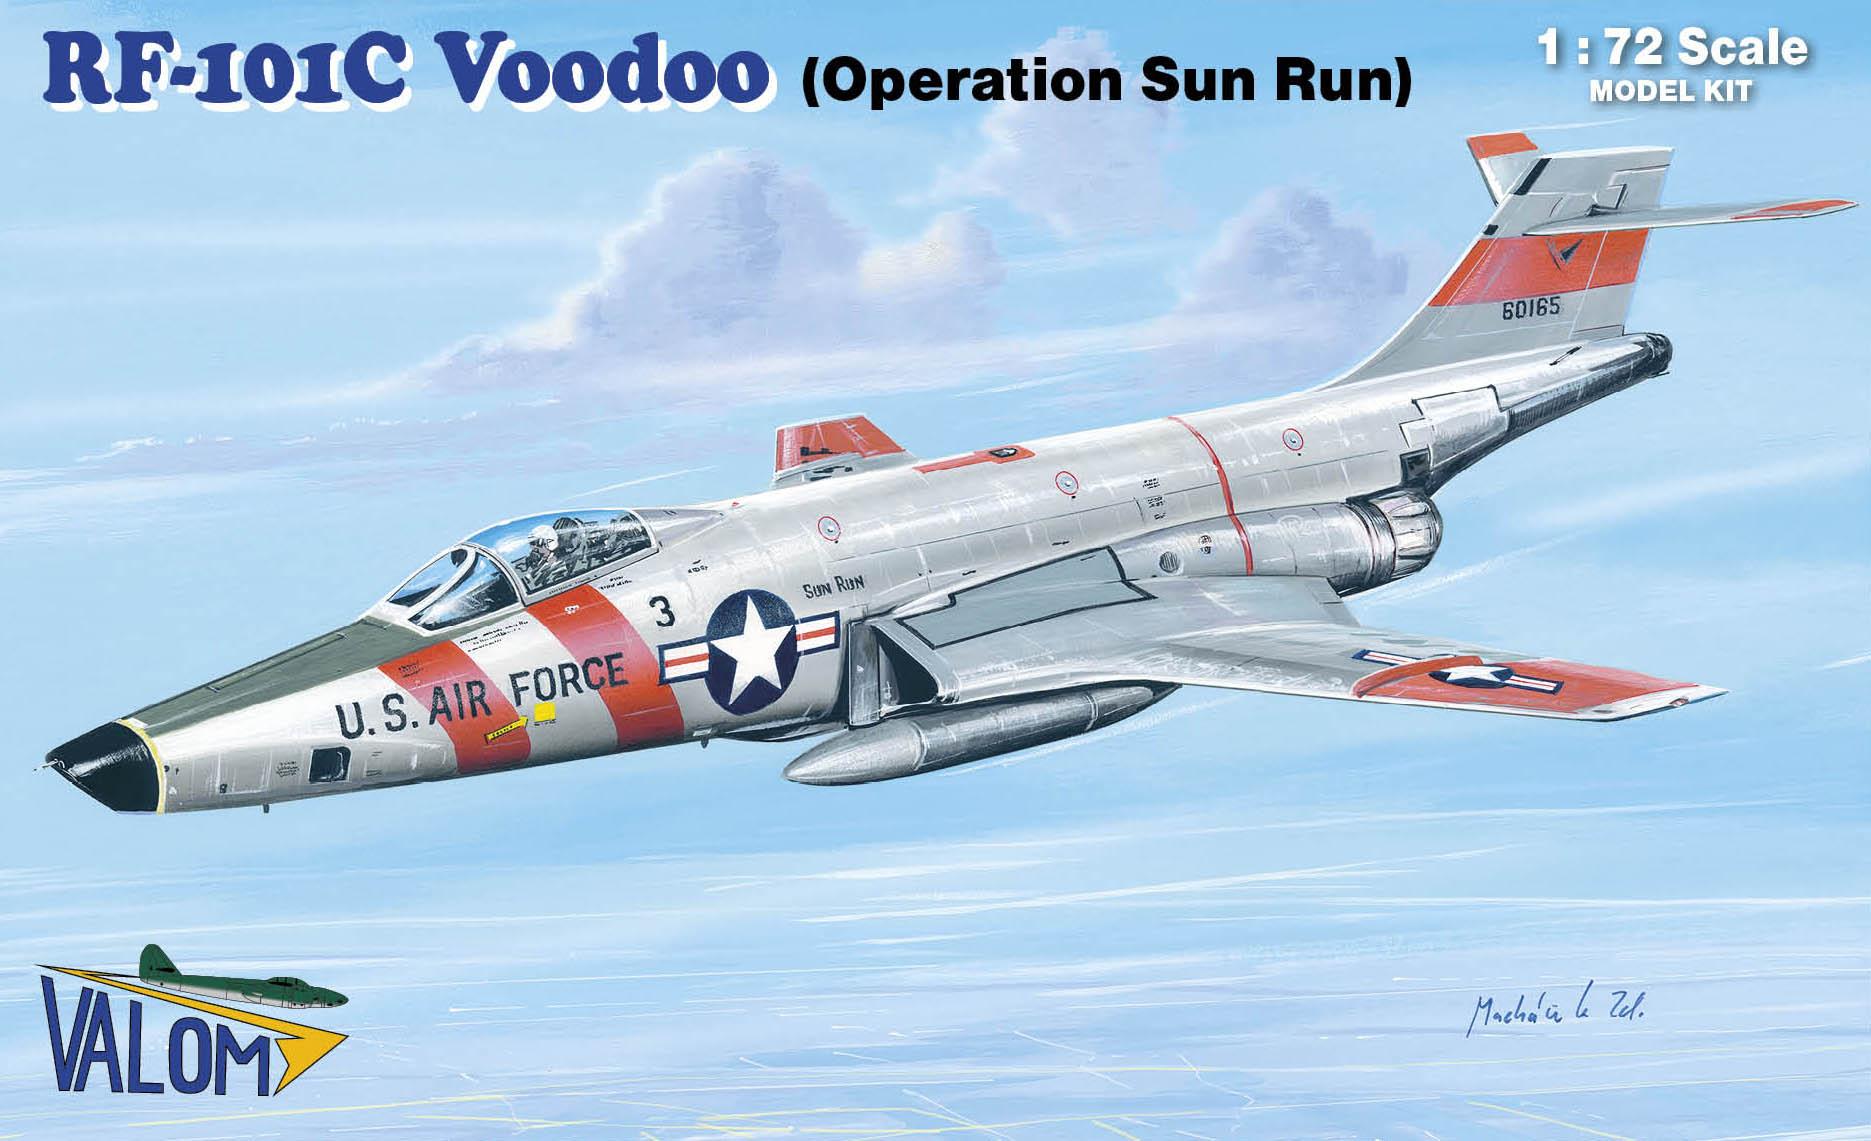 Valom RF-101C Voodoo (SUN-RUN)